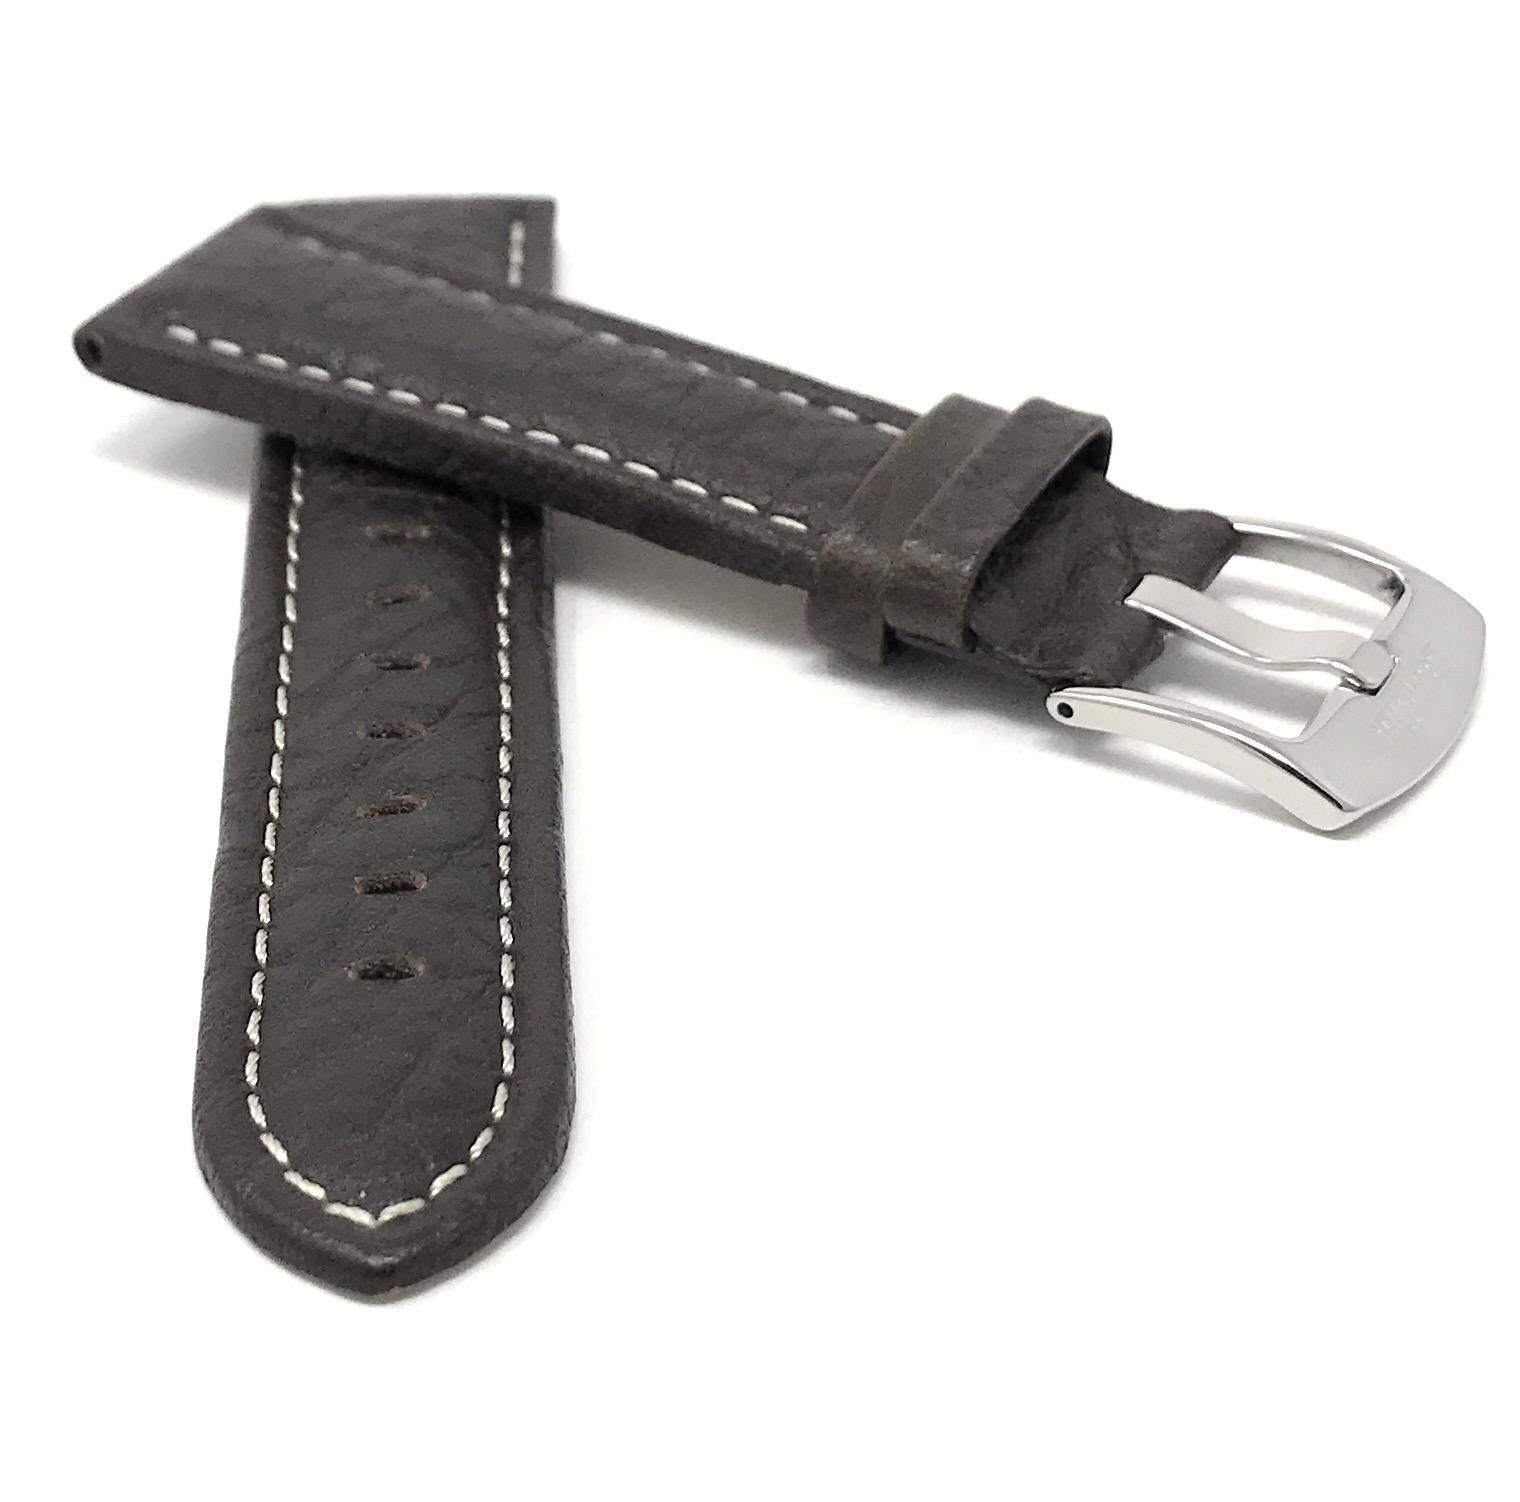 Bandini-Watch-Band-Leather-Strap-Buffalo-Pattern-18mm-30mm-Extra-Long-Also thumbnail 26